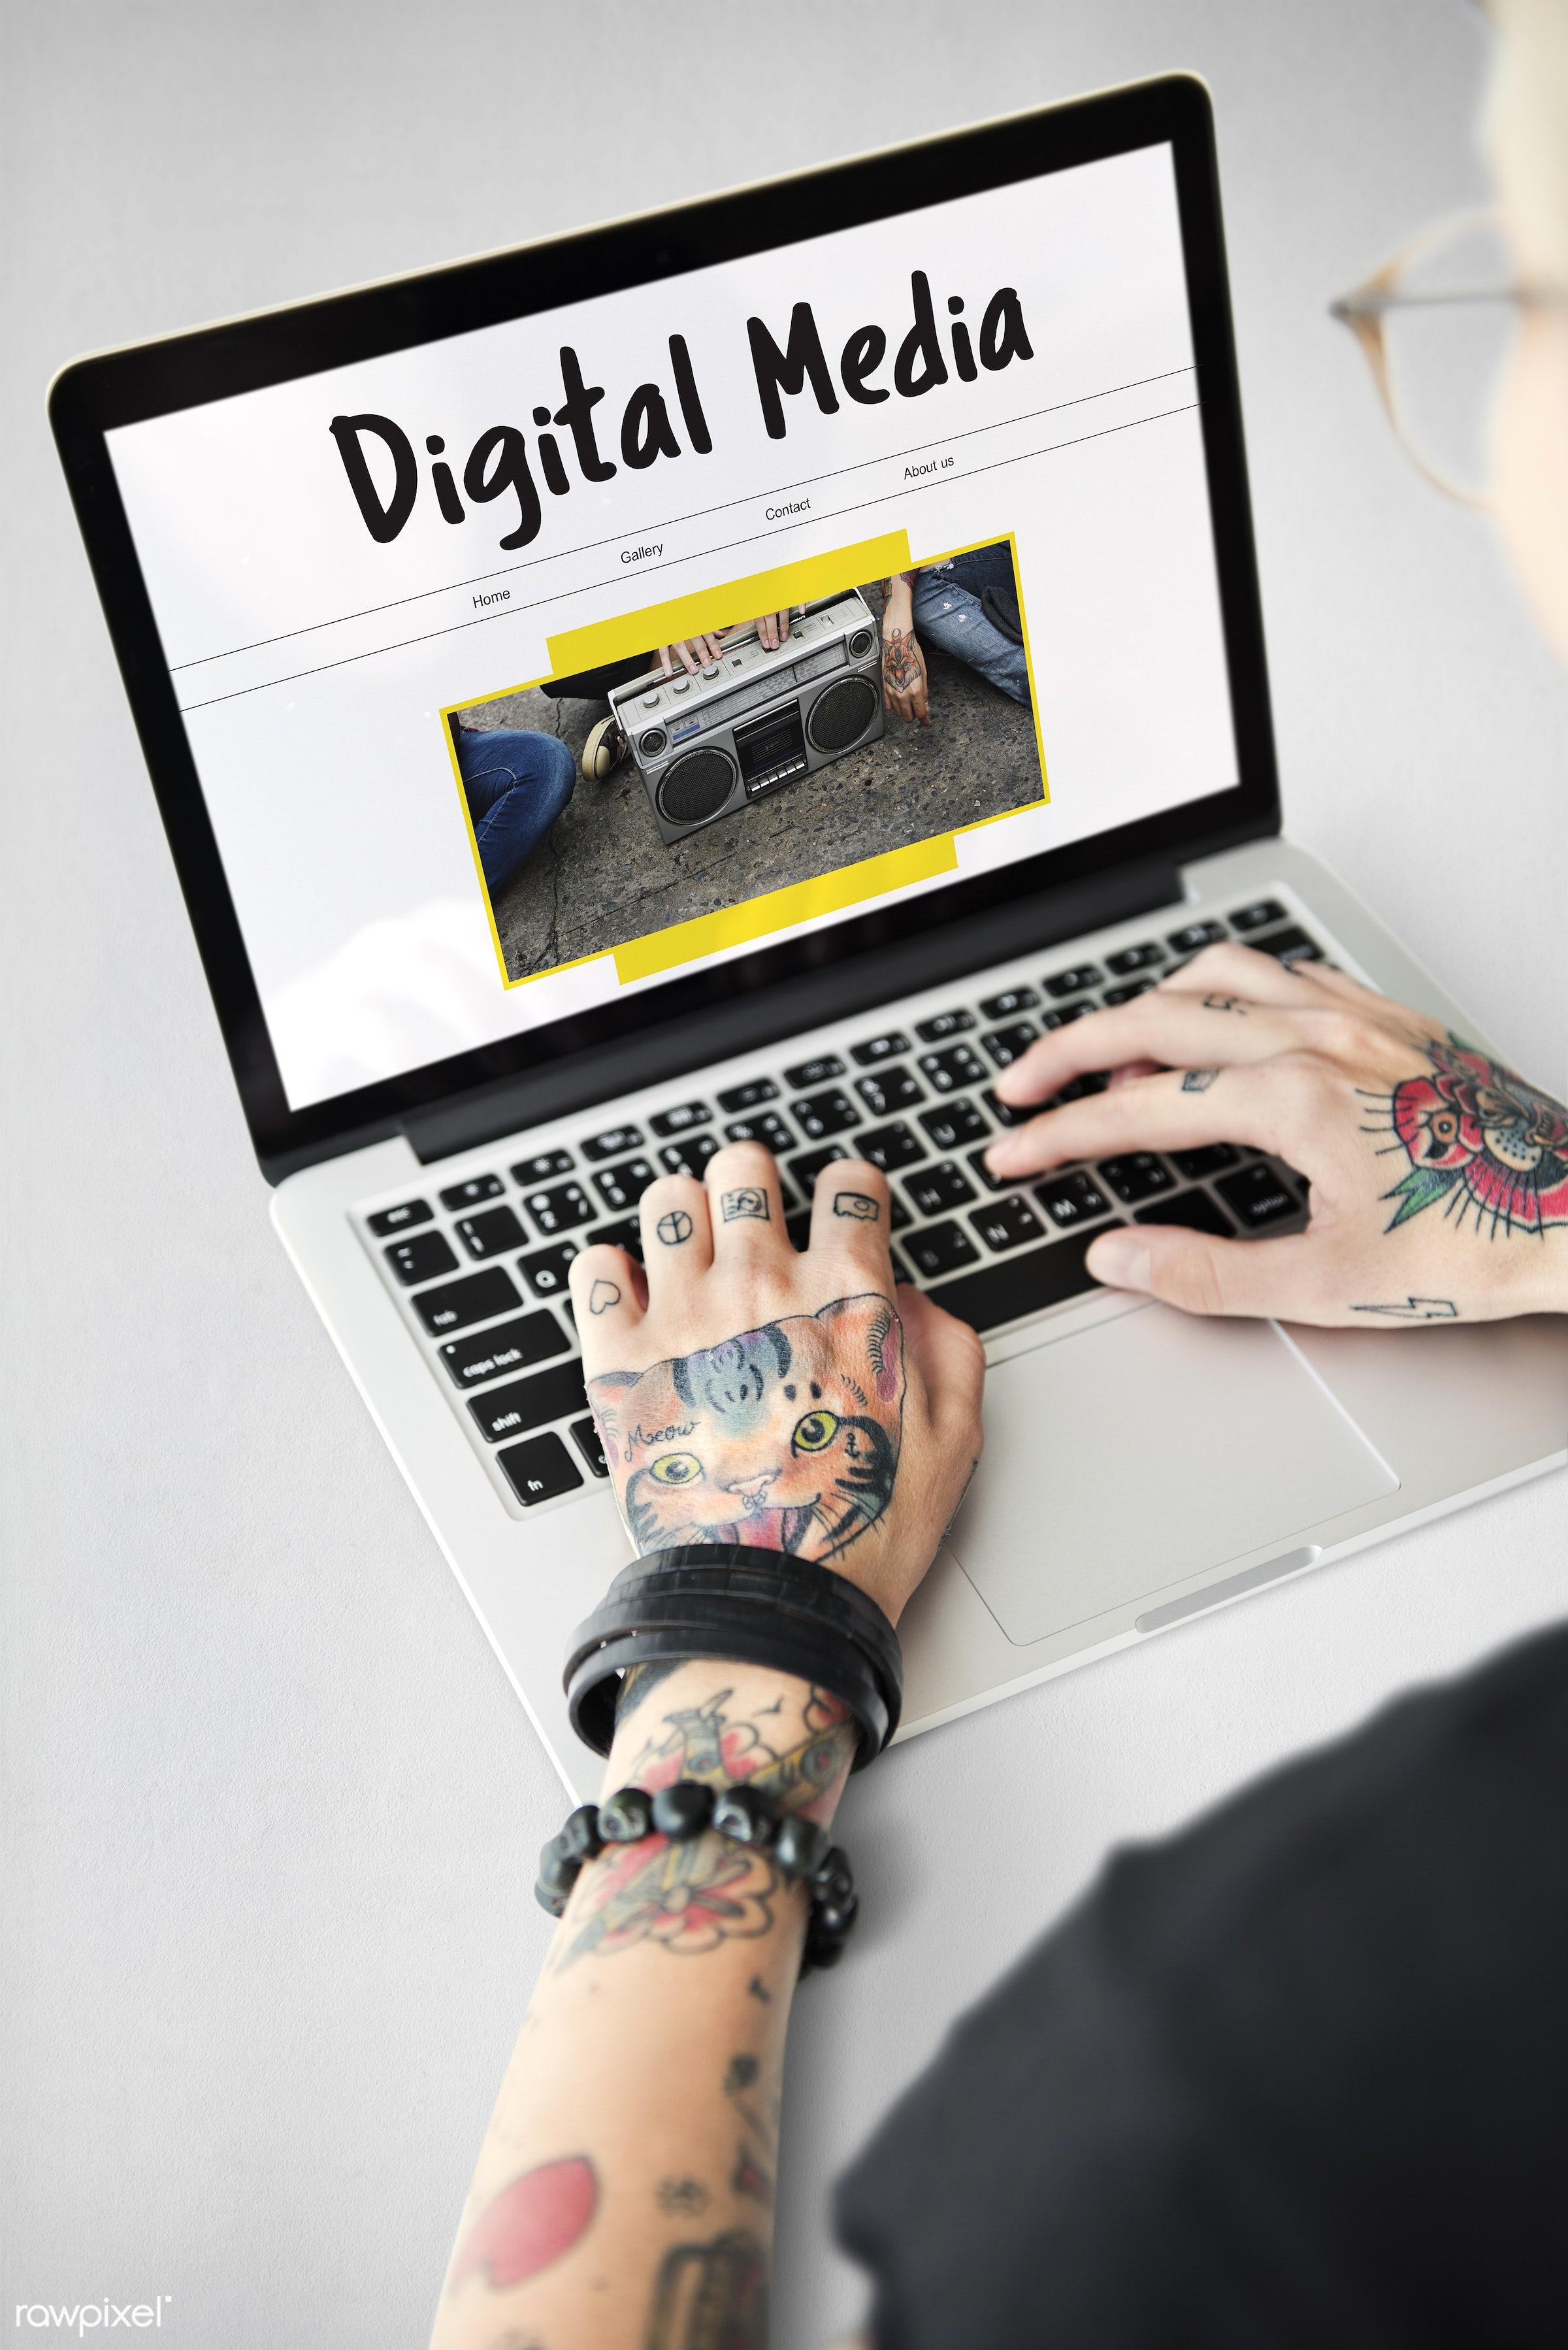 adult, arm, art, articles, body paint, bracelet, broadcast, caucasian, connection, data, device, digital, digital media,...